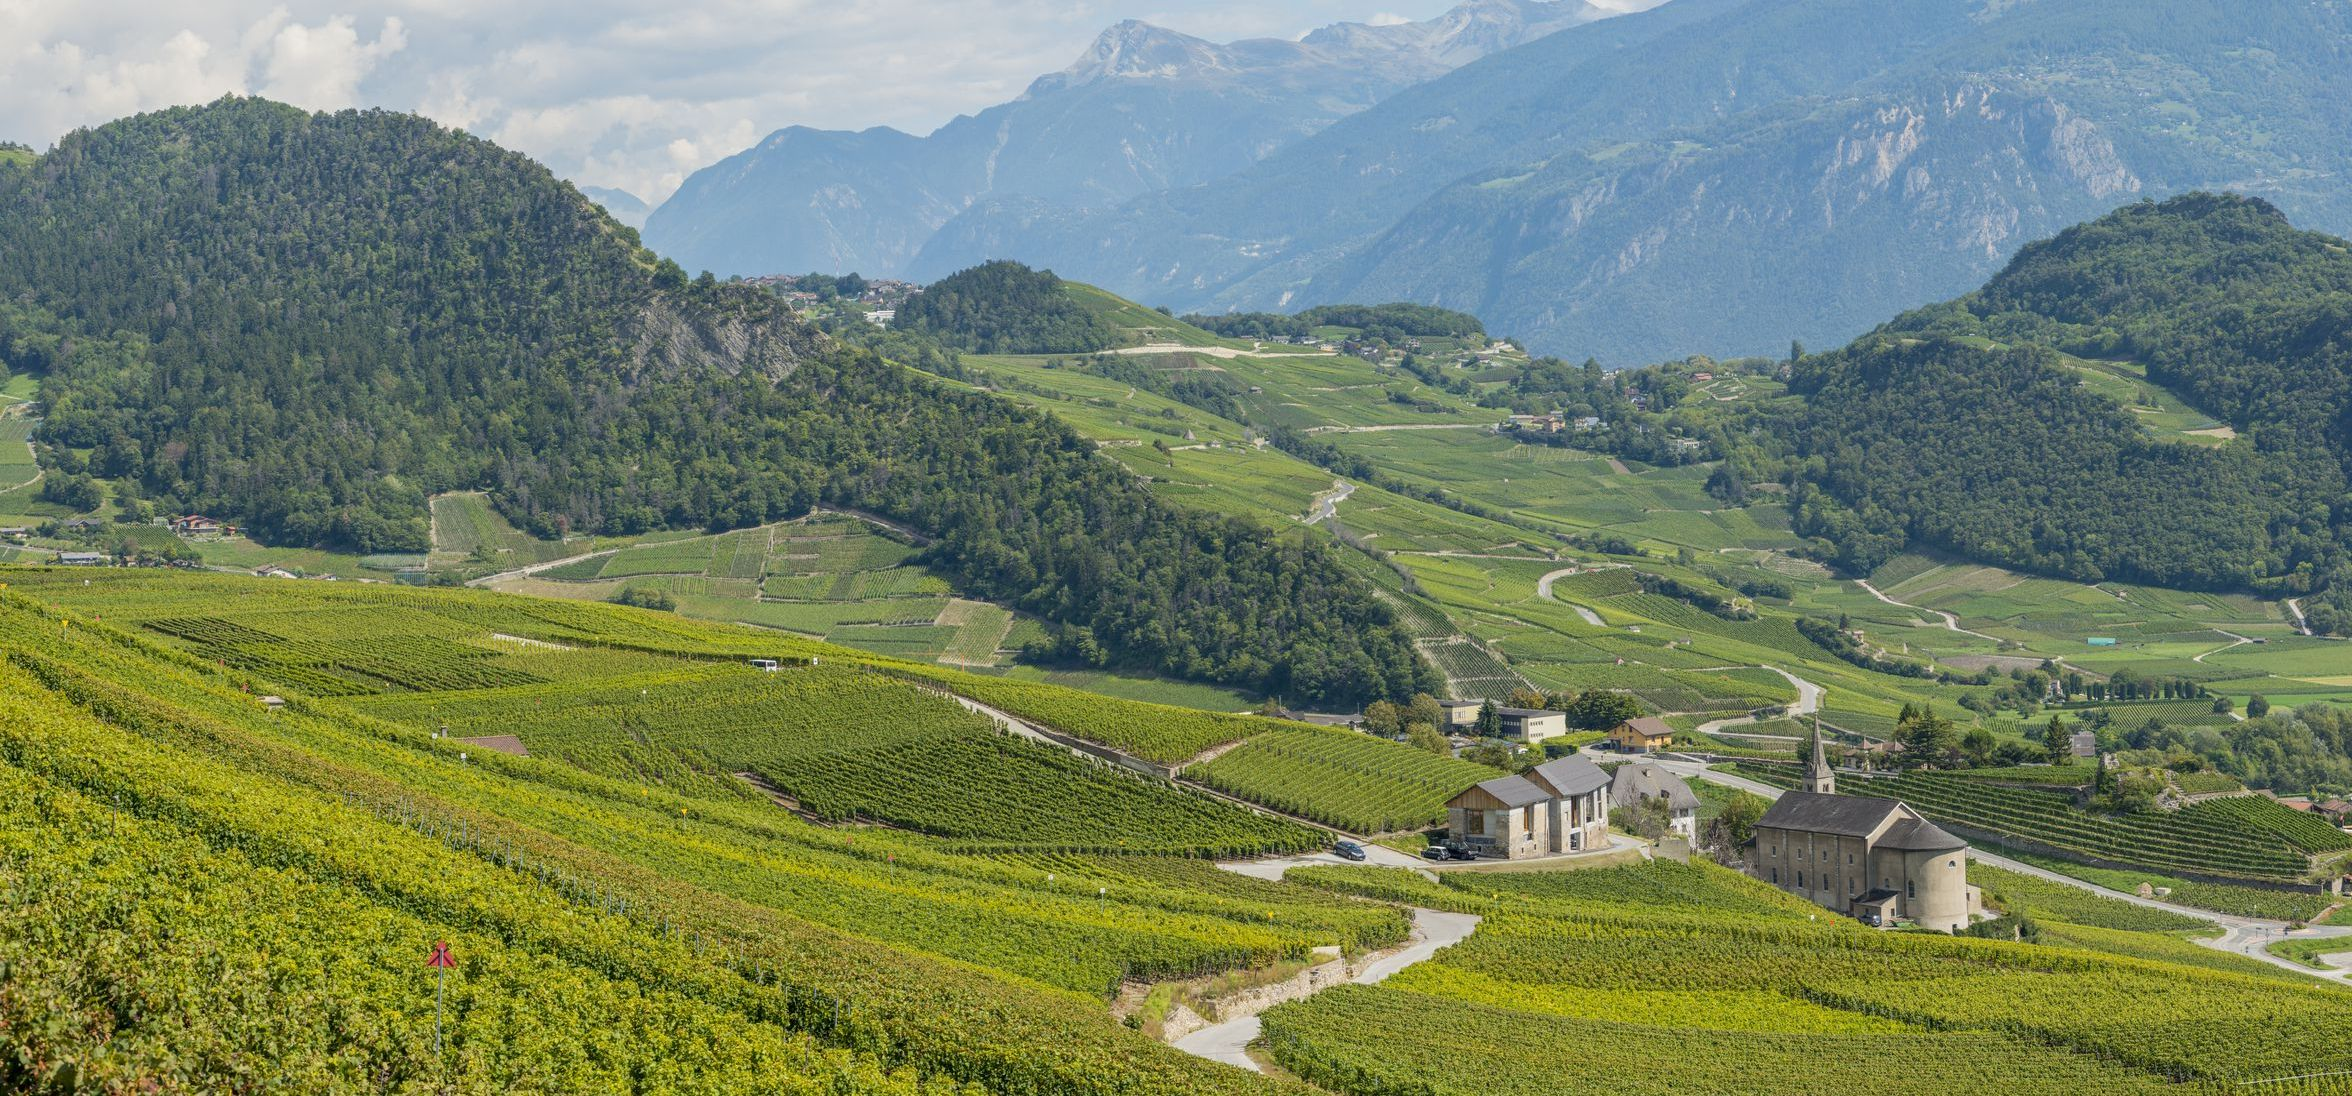 Rhone Valley, vine growing area